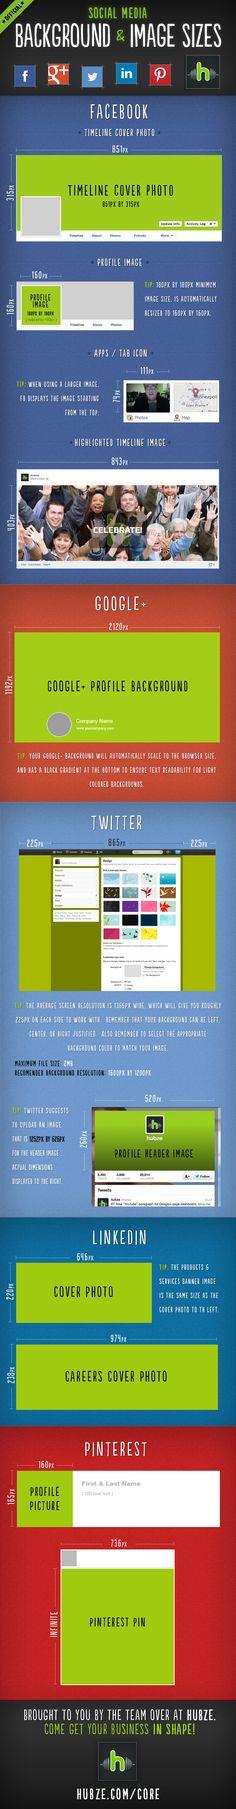 Social Platform Image Sizes